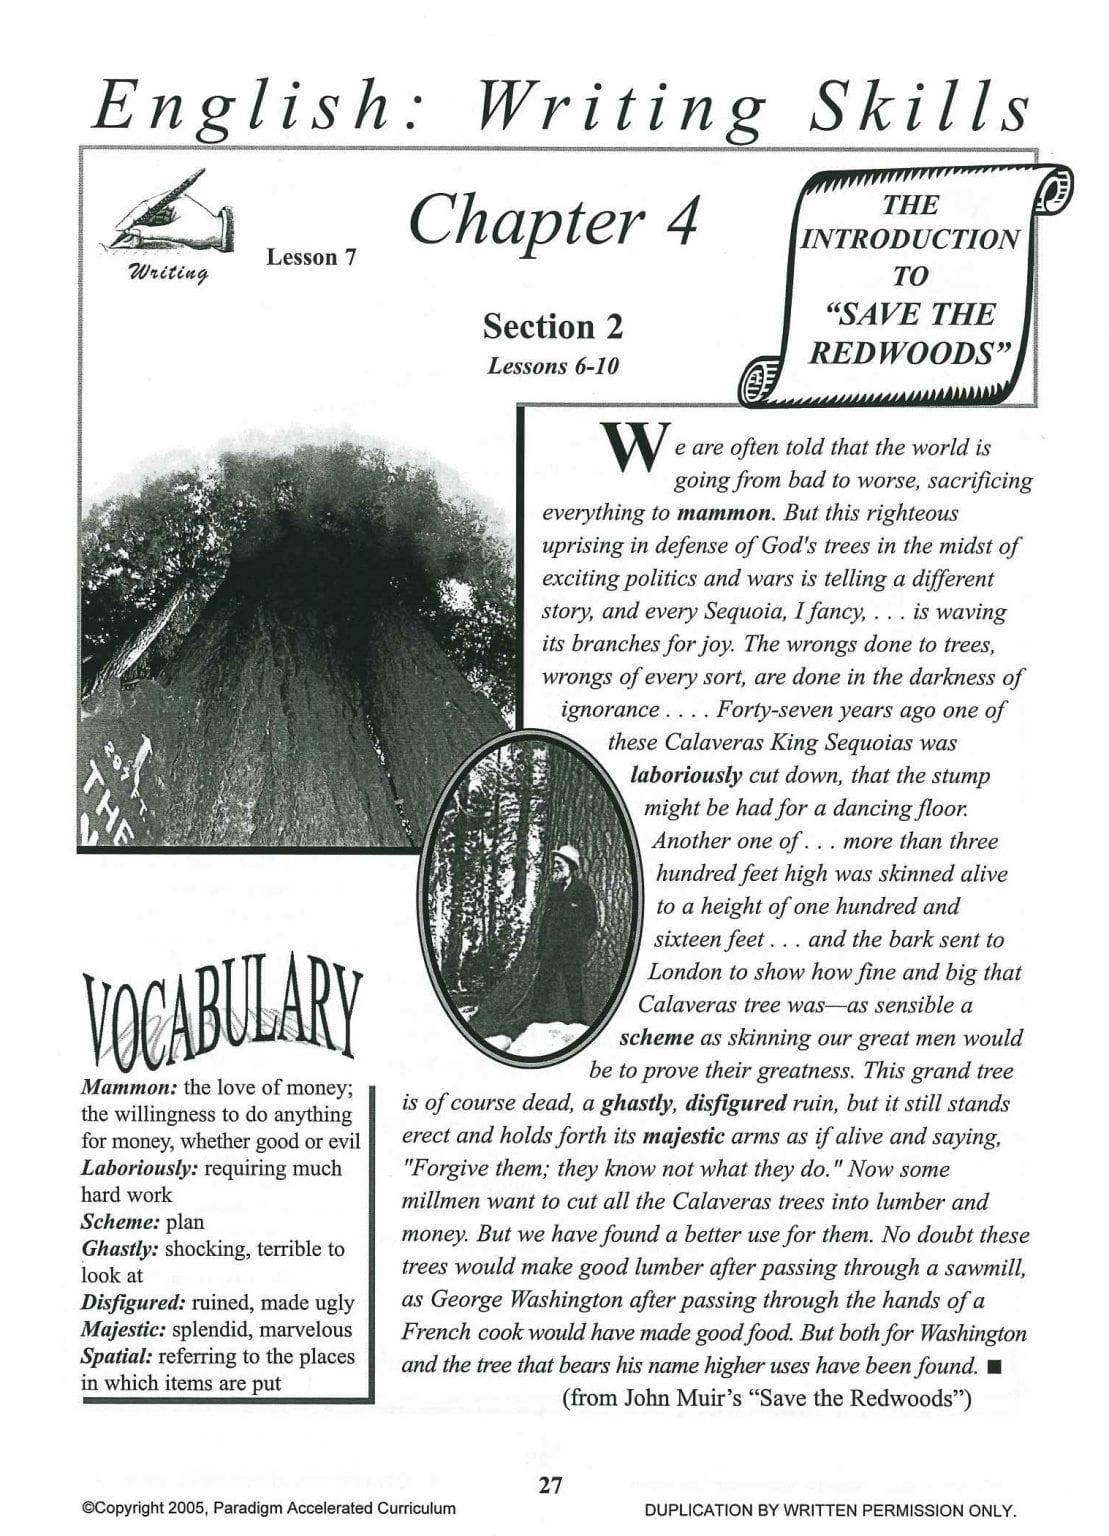 English III: Writing Skills Chapter 4 Text. Save Now!